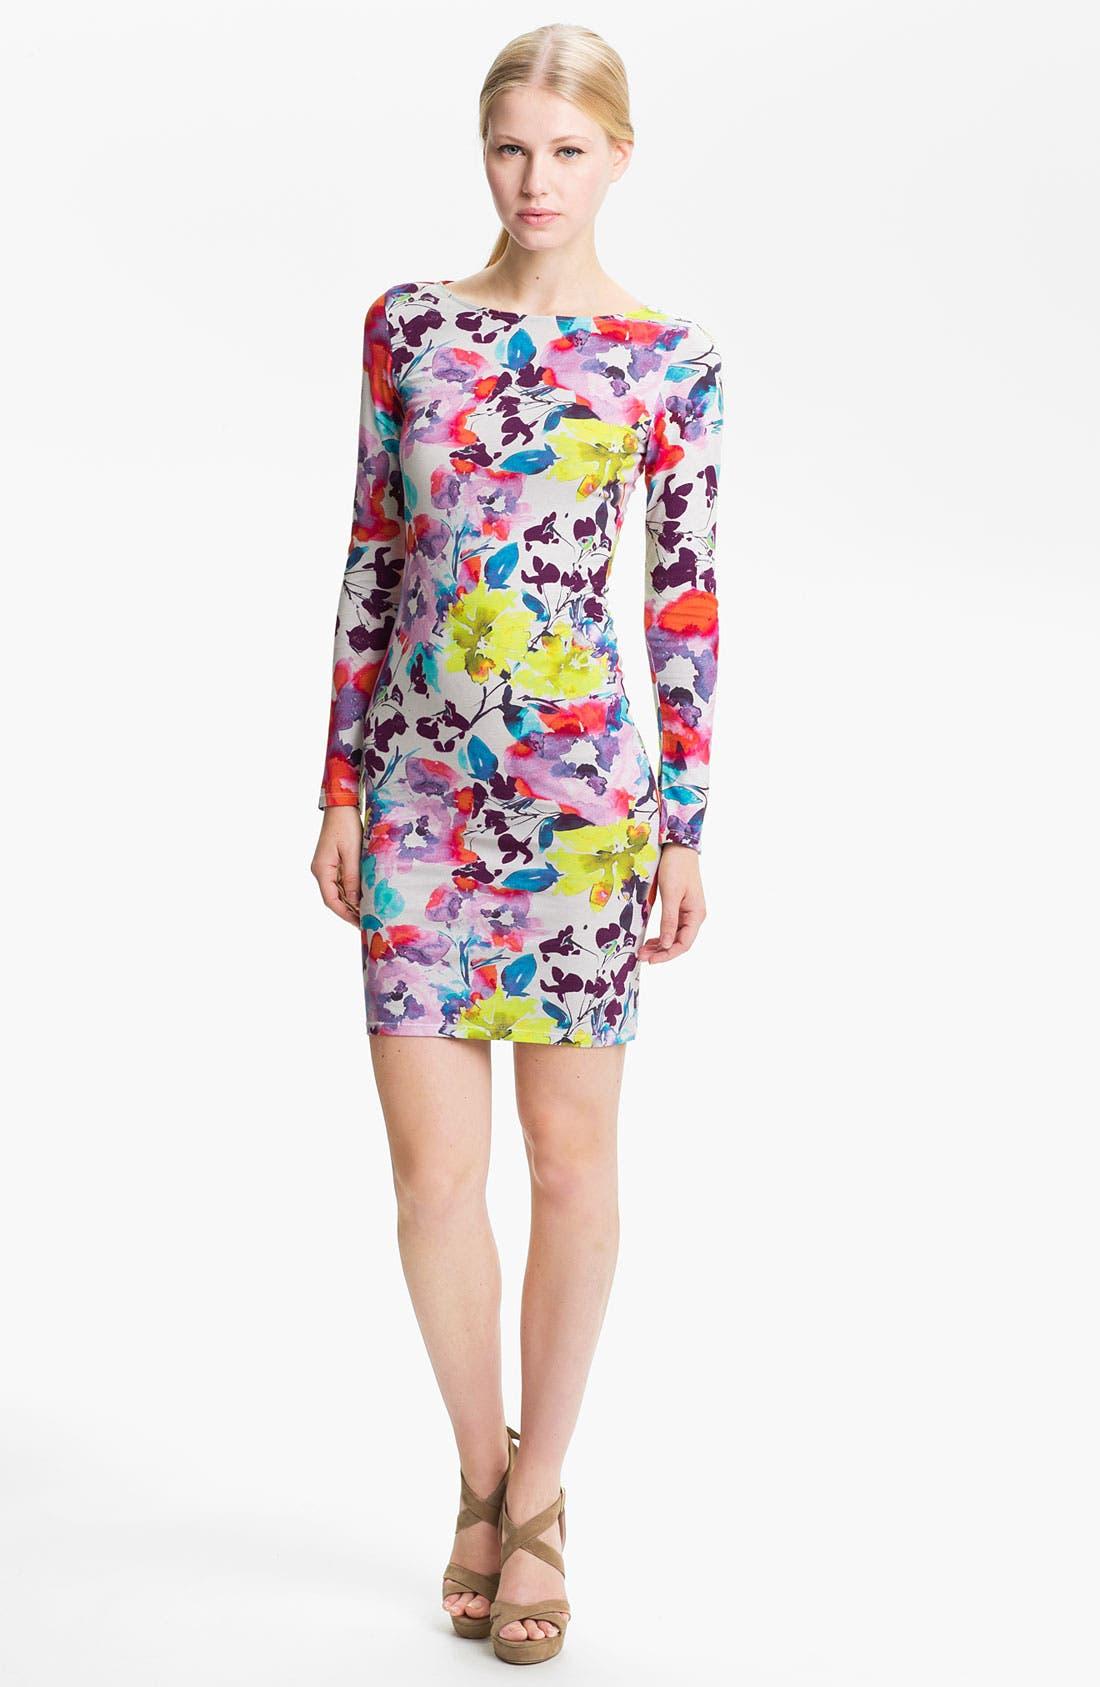 Alternate Image 1 Selected - Alice + Olivia 'Tabitha' Floral Print Jersey Dress